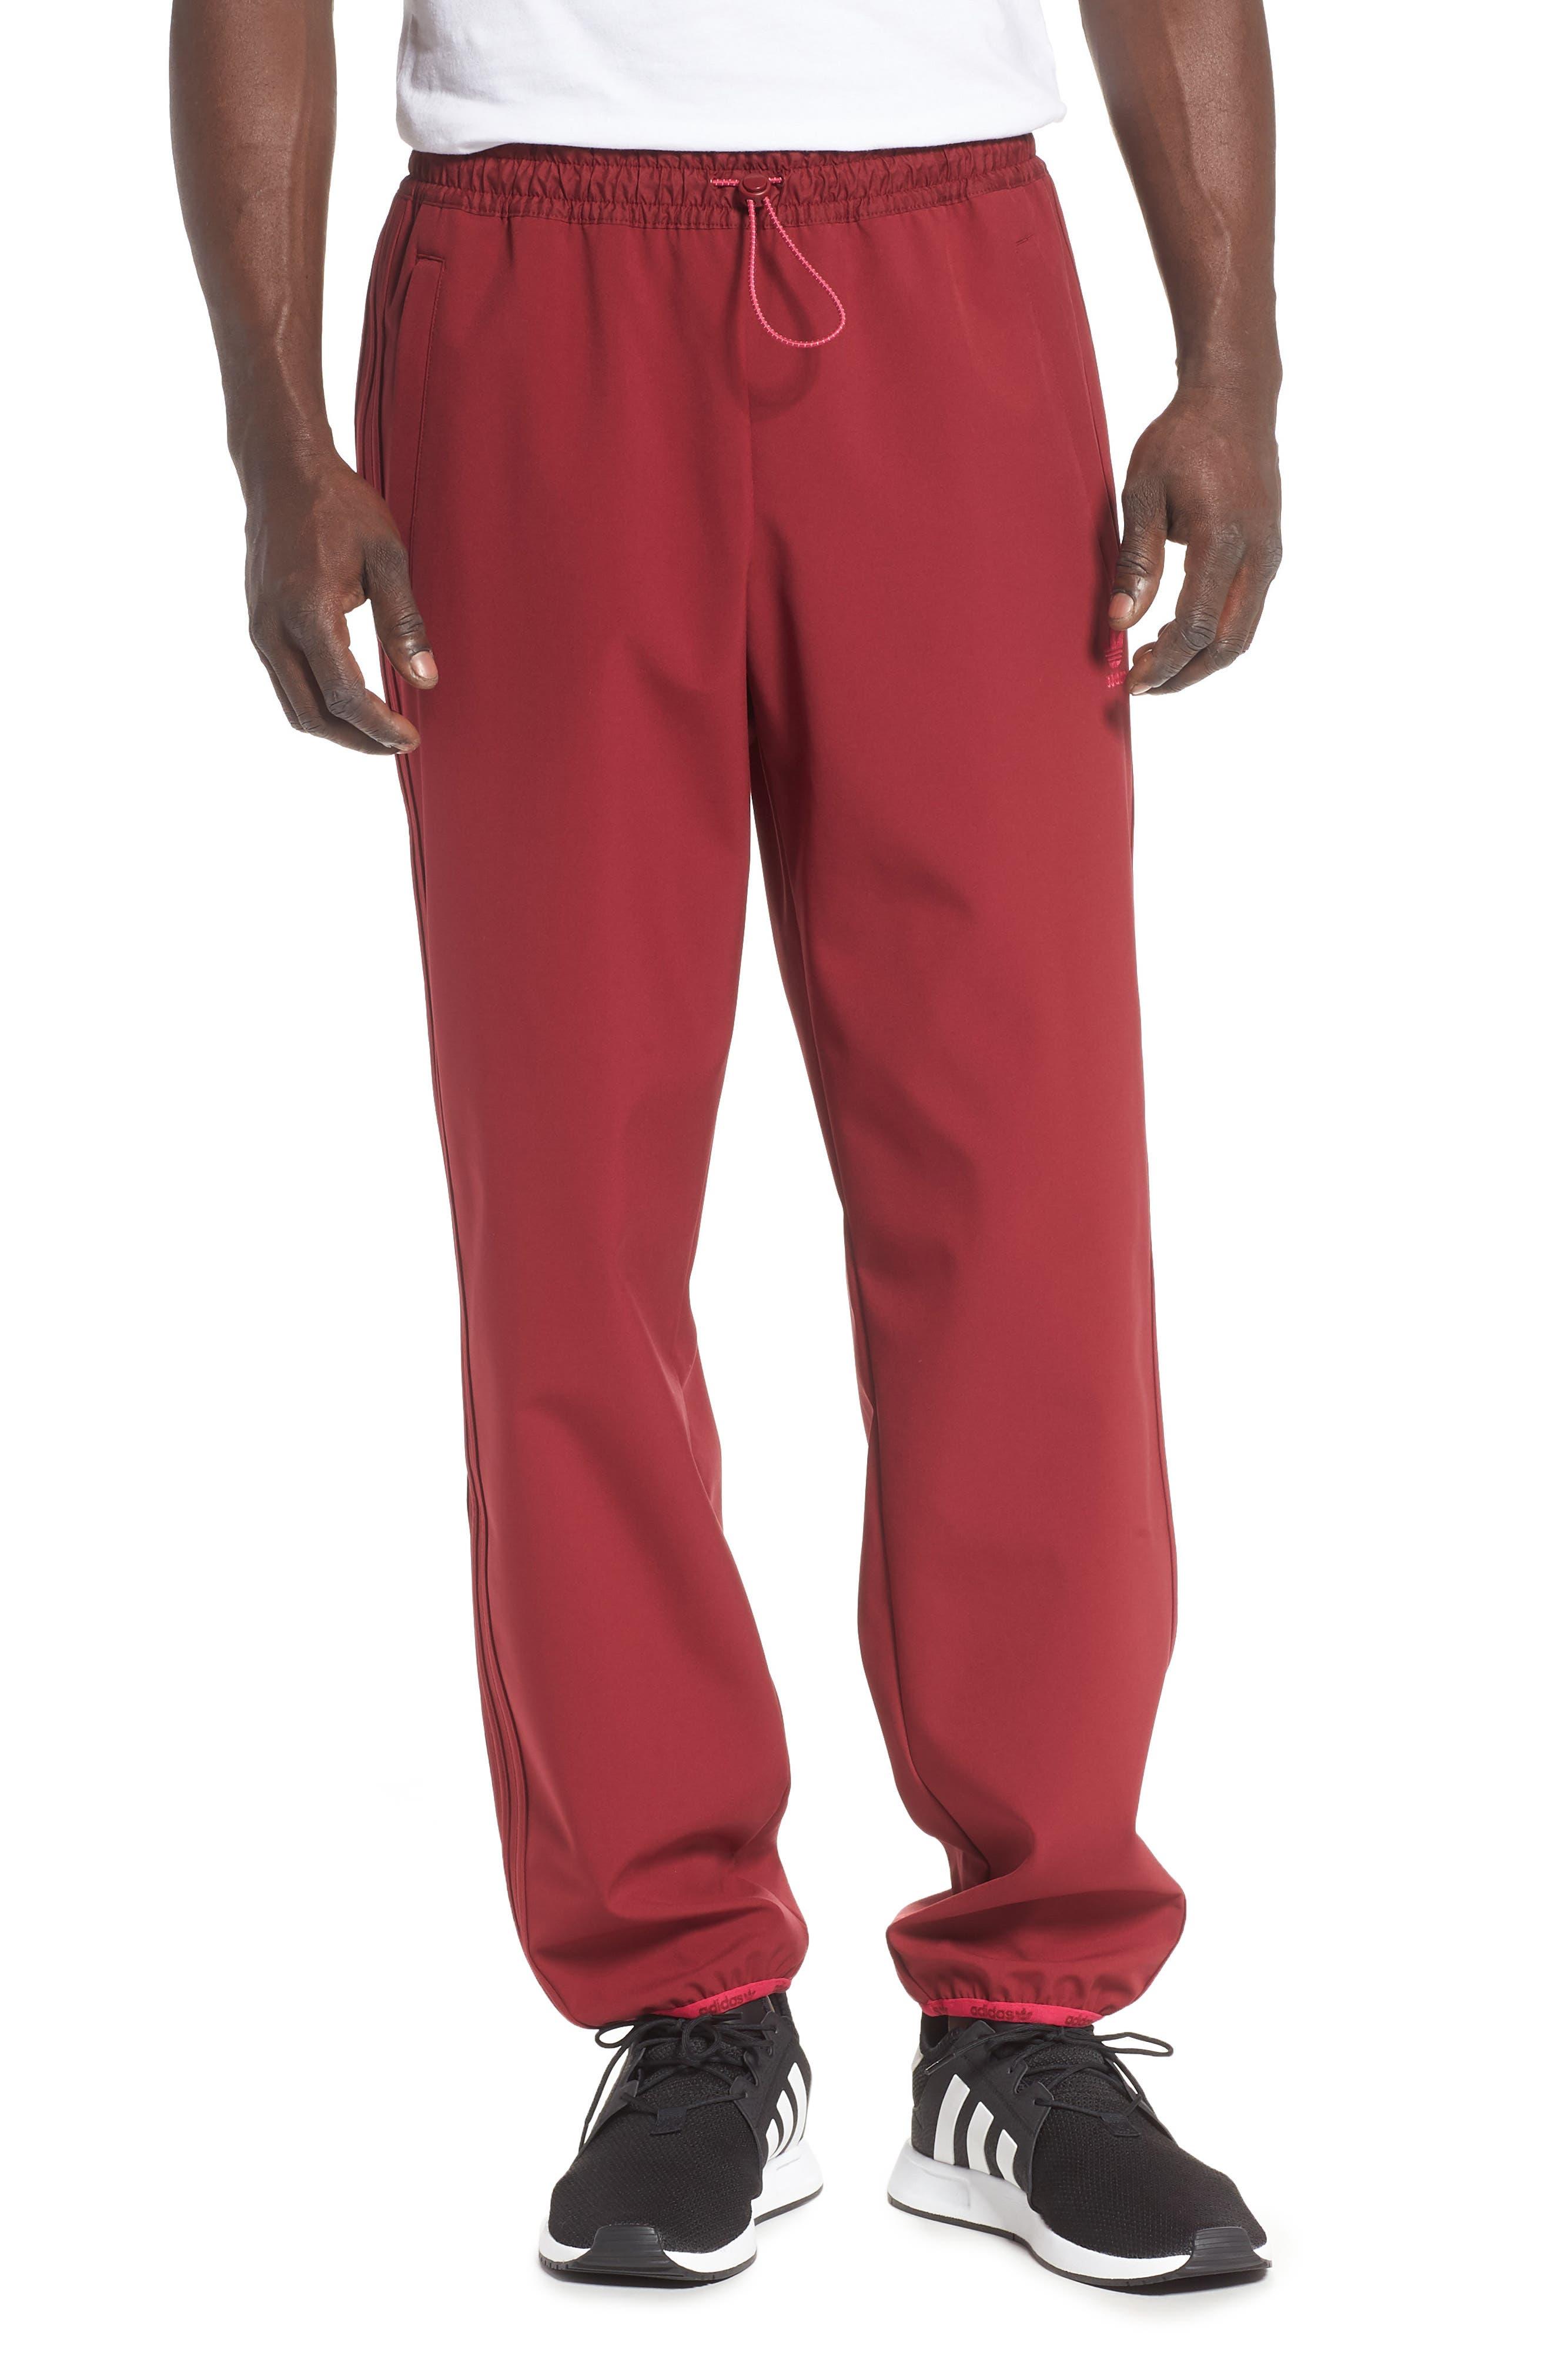 Men's Adidas Originals Speed Pack Track Pants